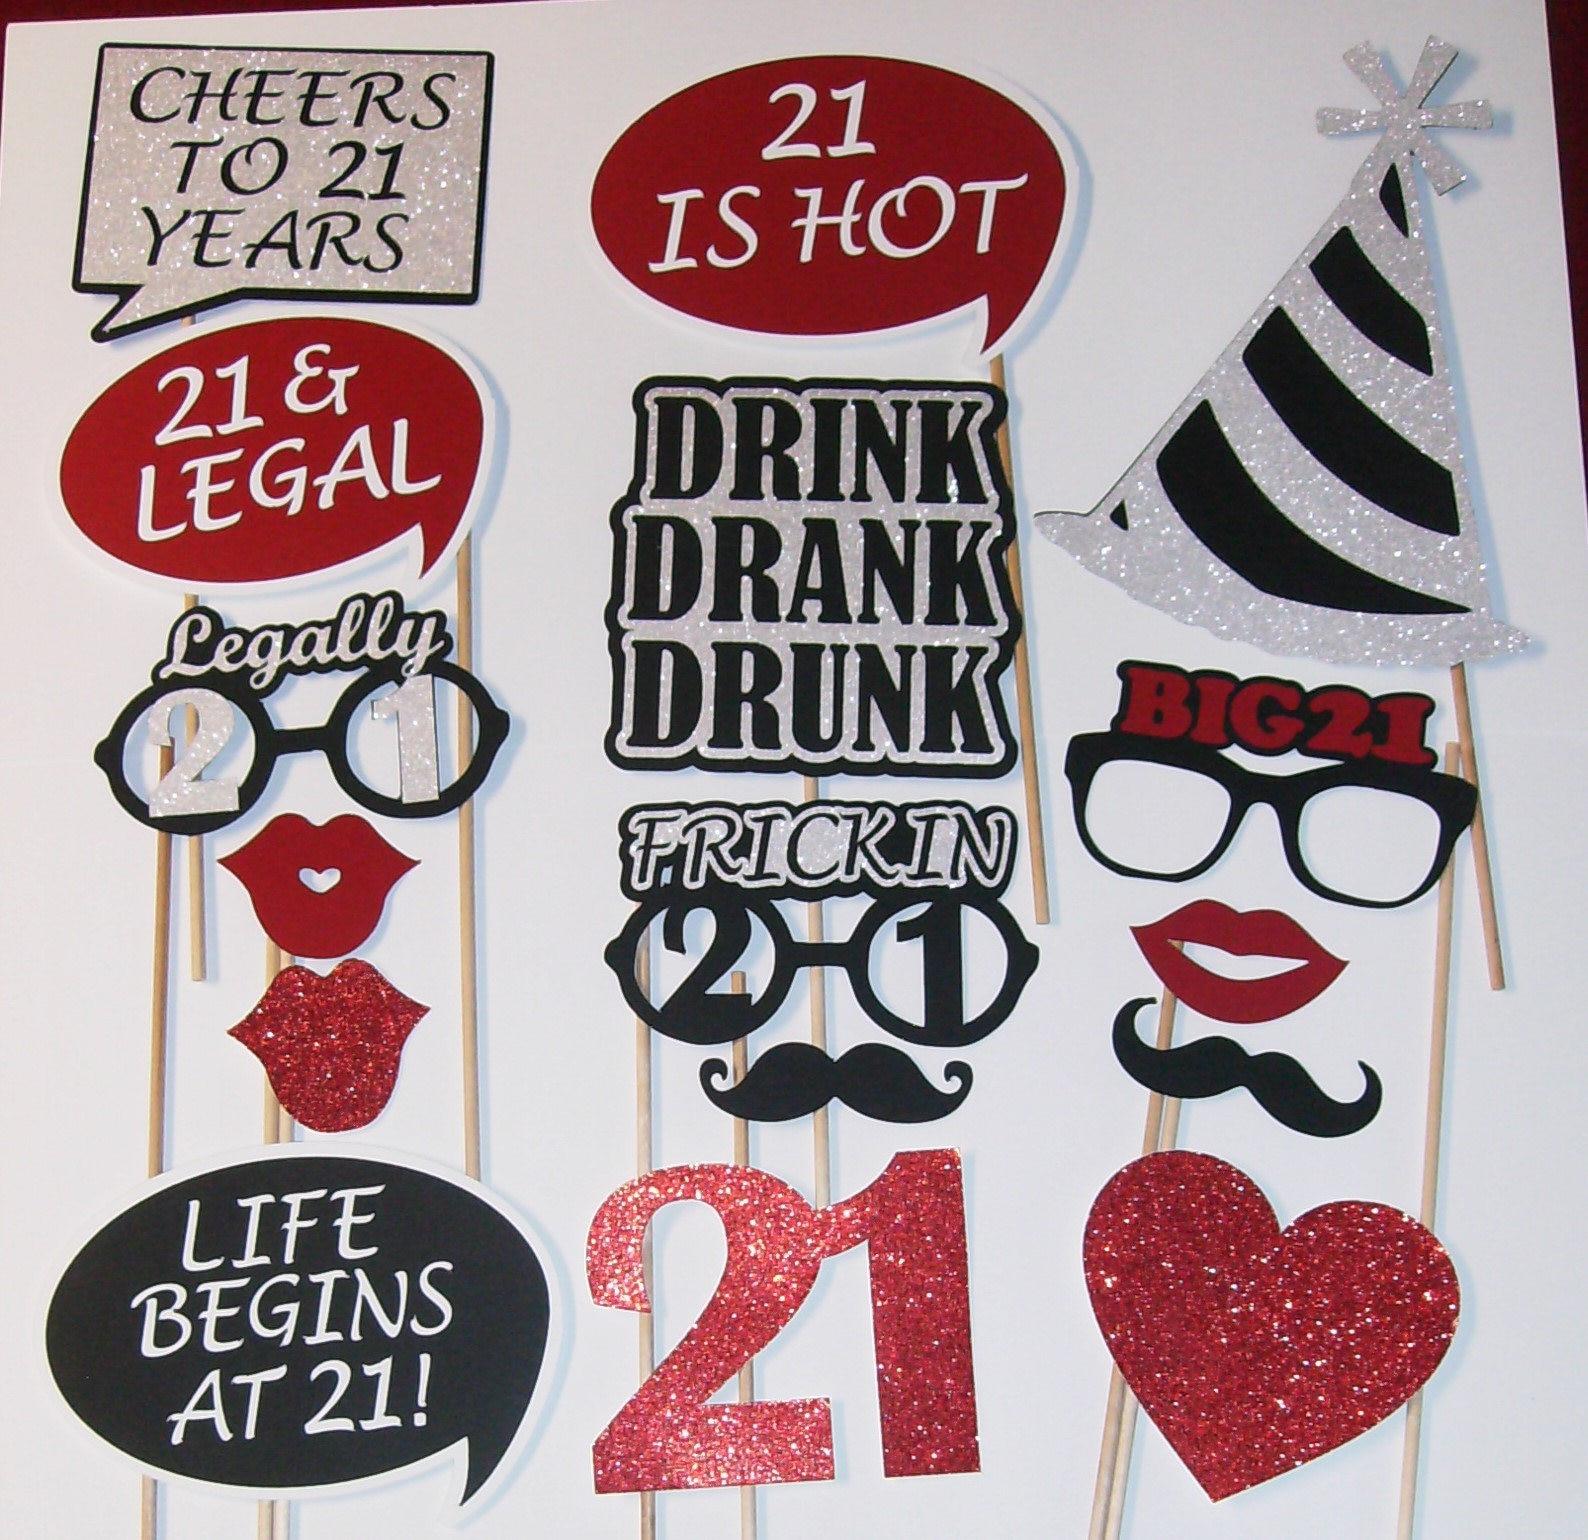 21st Birthday Photo Prop / Drink Drank Drunk / Legal 2207D